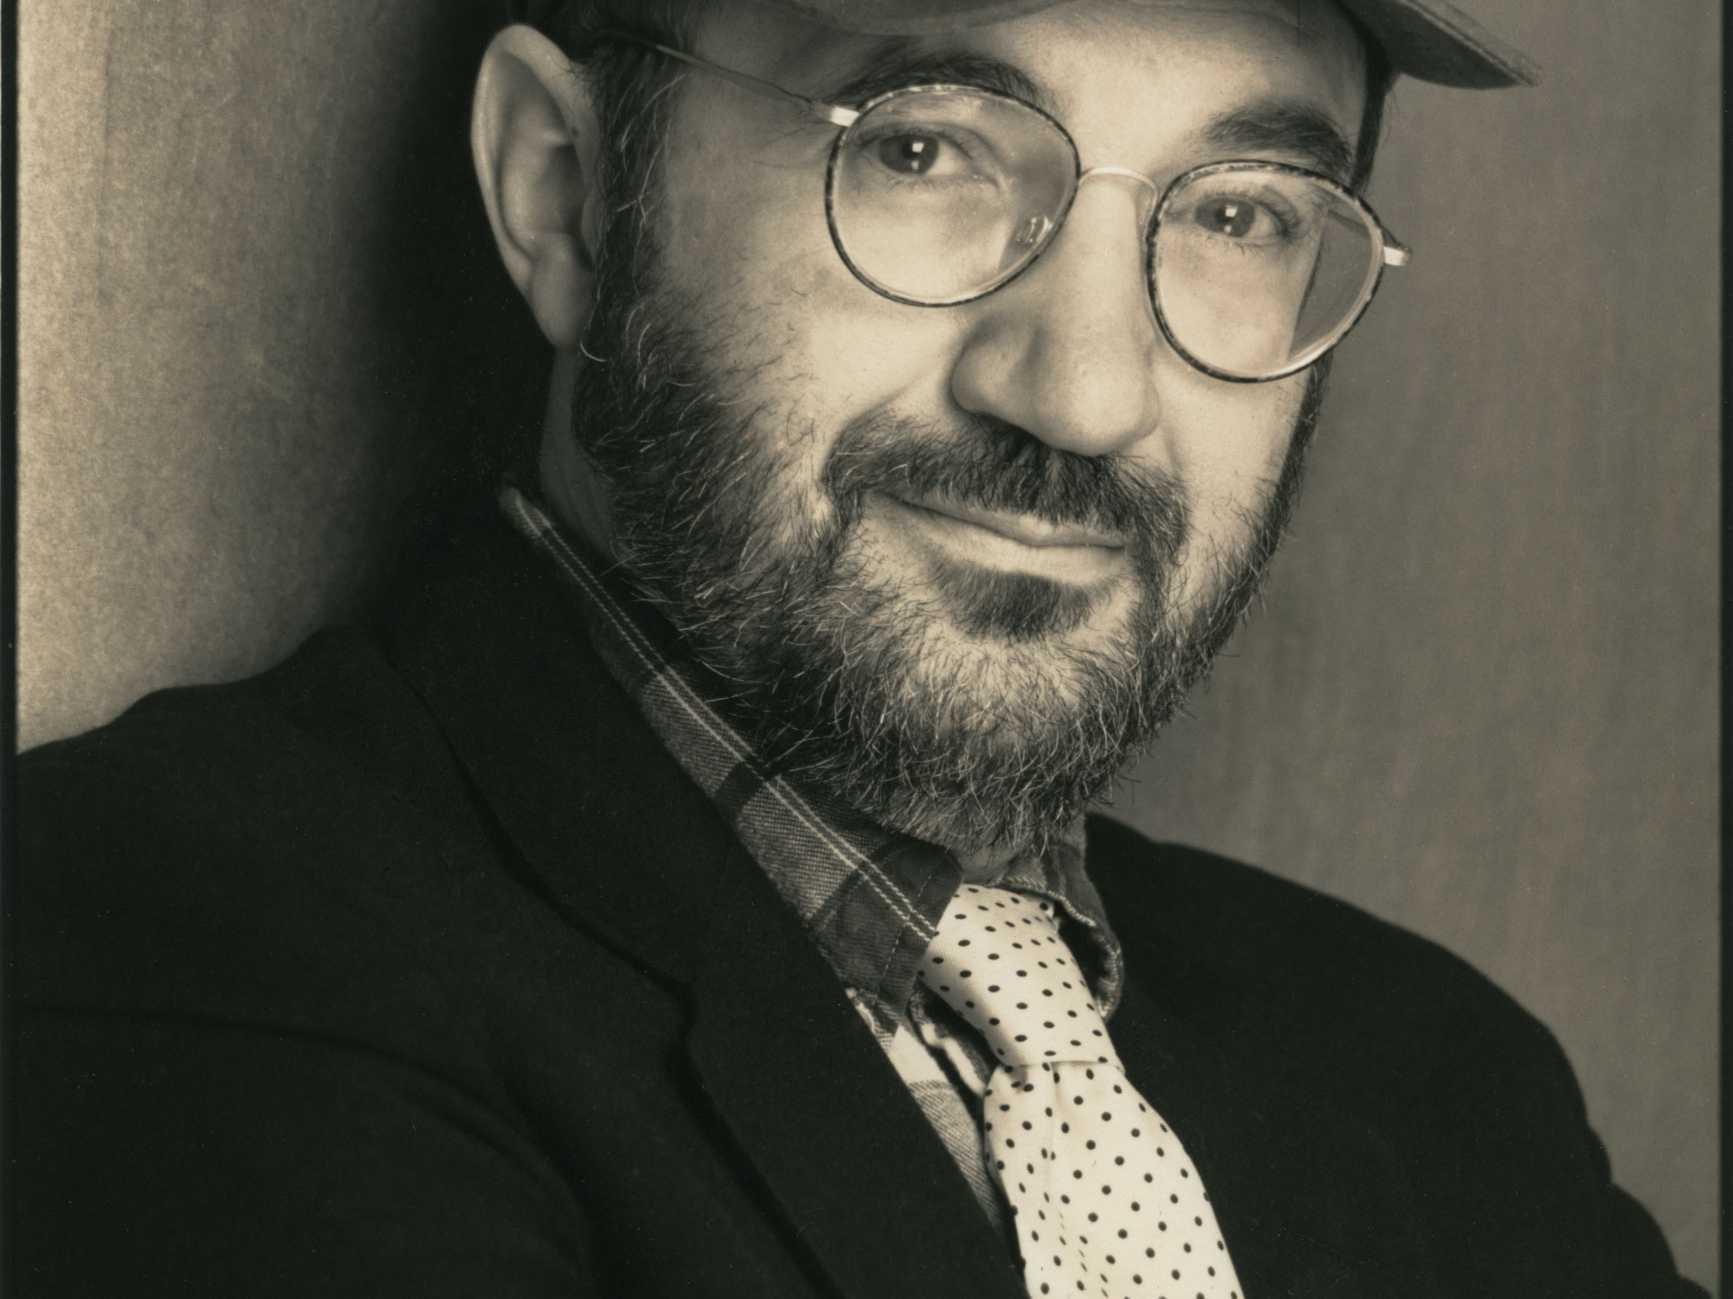 Director John Scagliotti Explores LGBT Culture in 'Before Homosexuals'